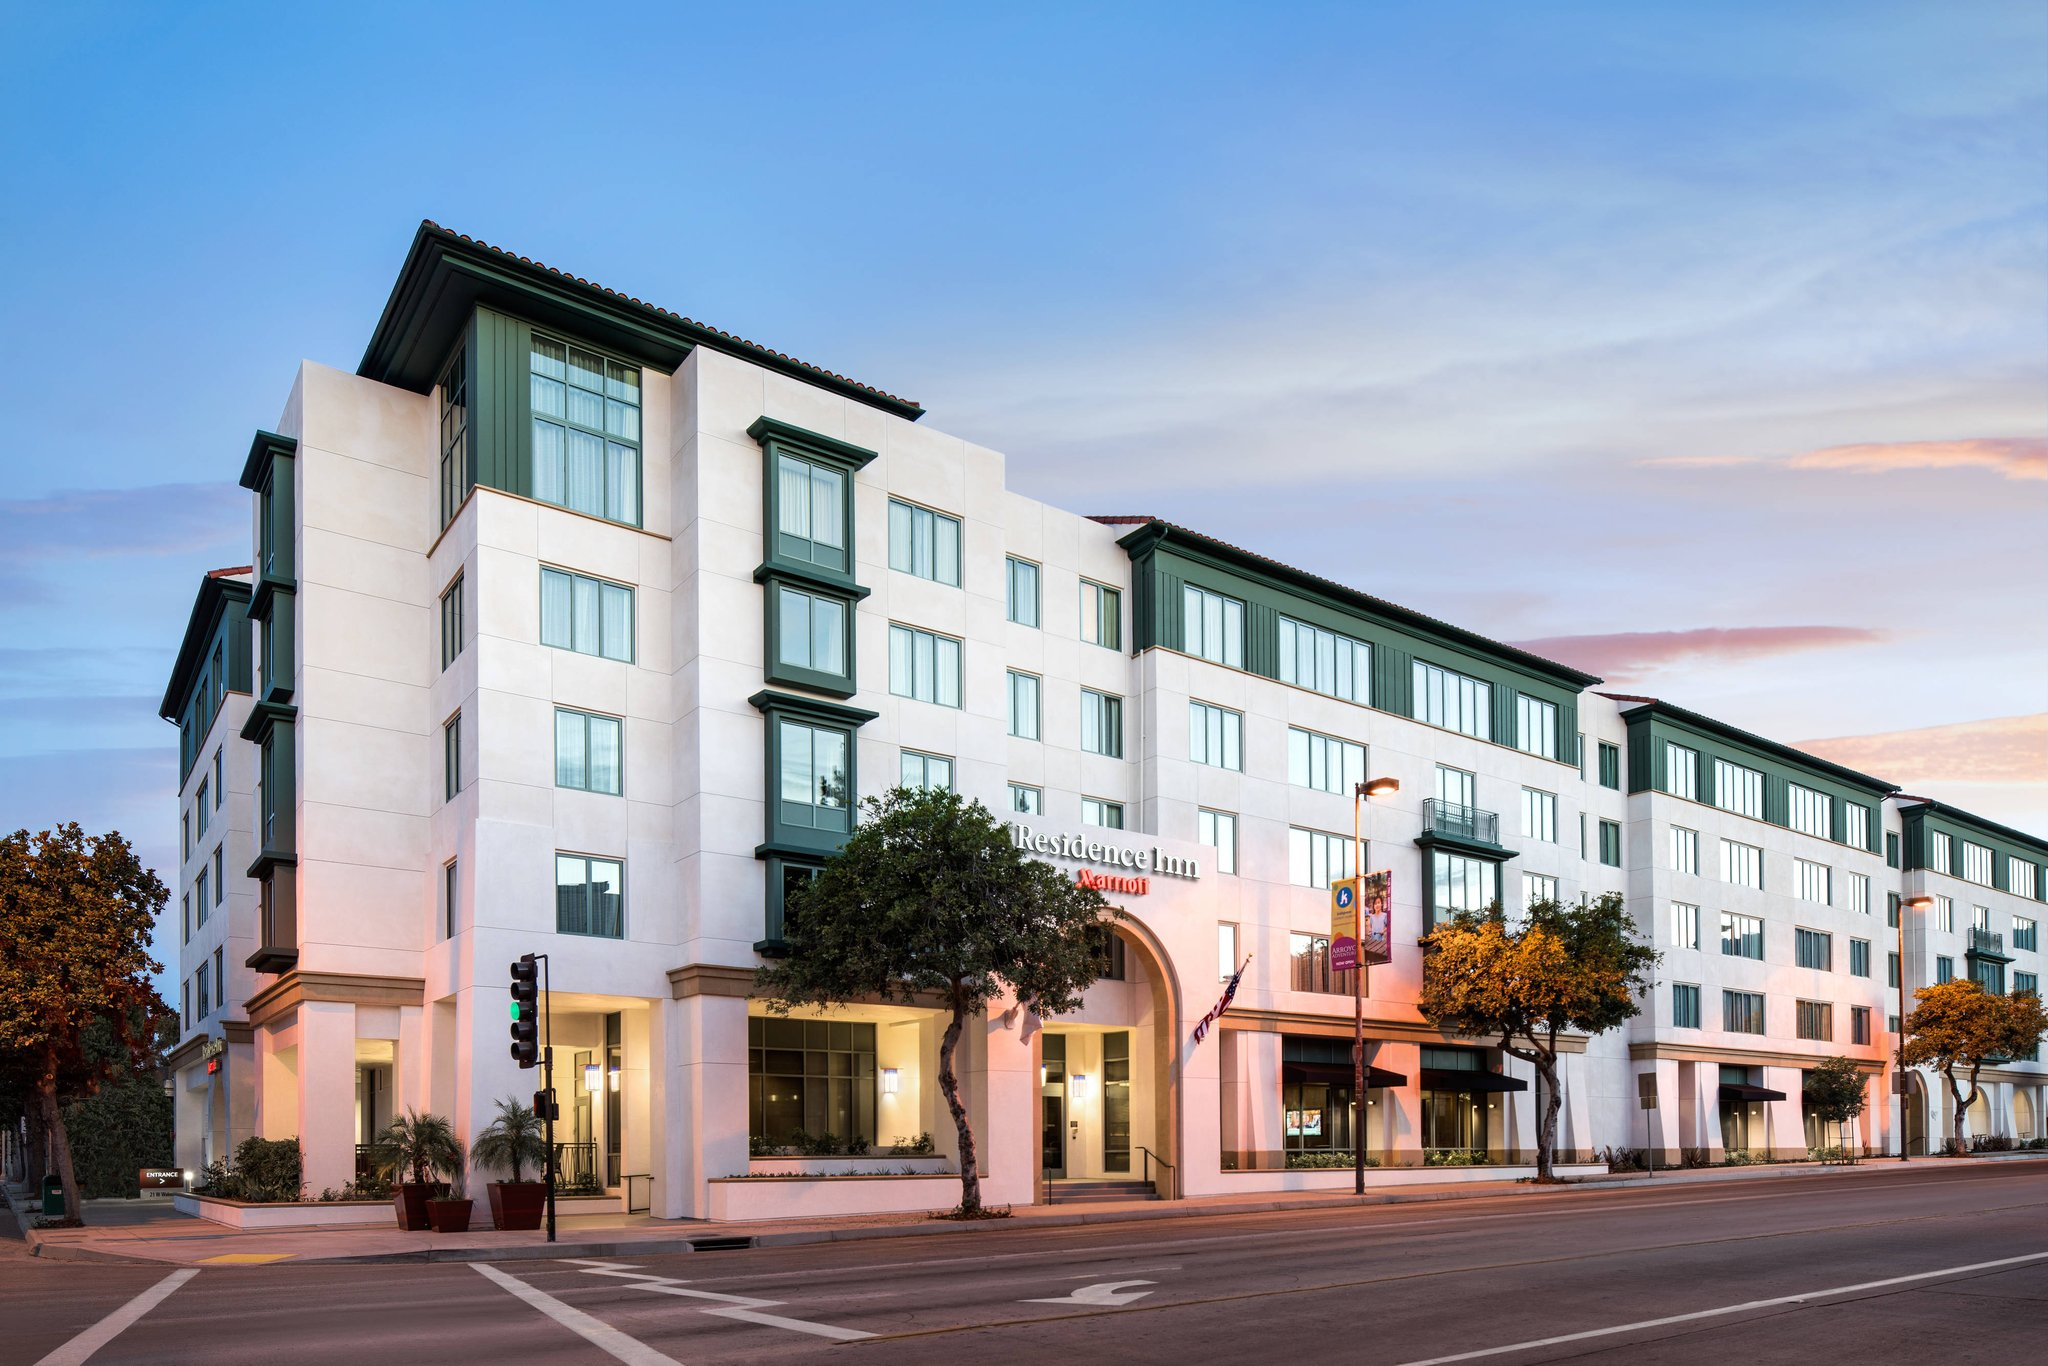 Residence Inn LA Pasadena/Old Town